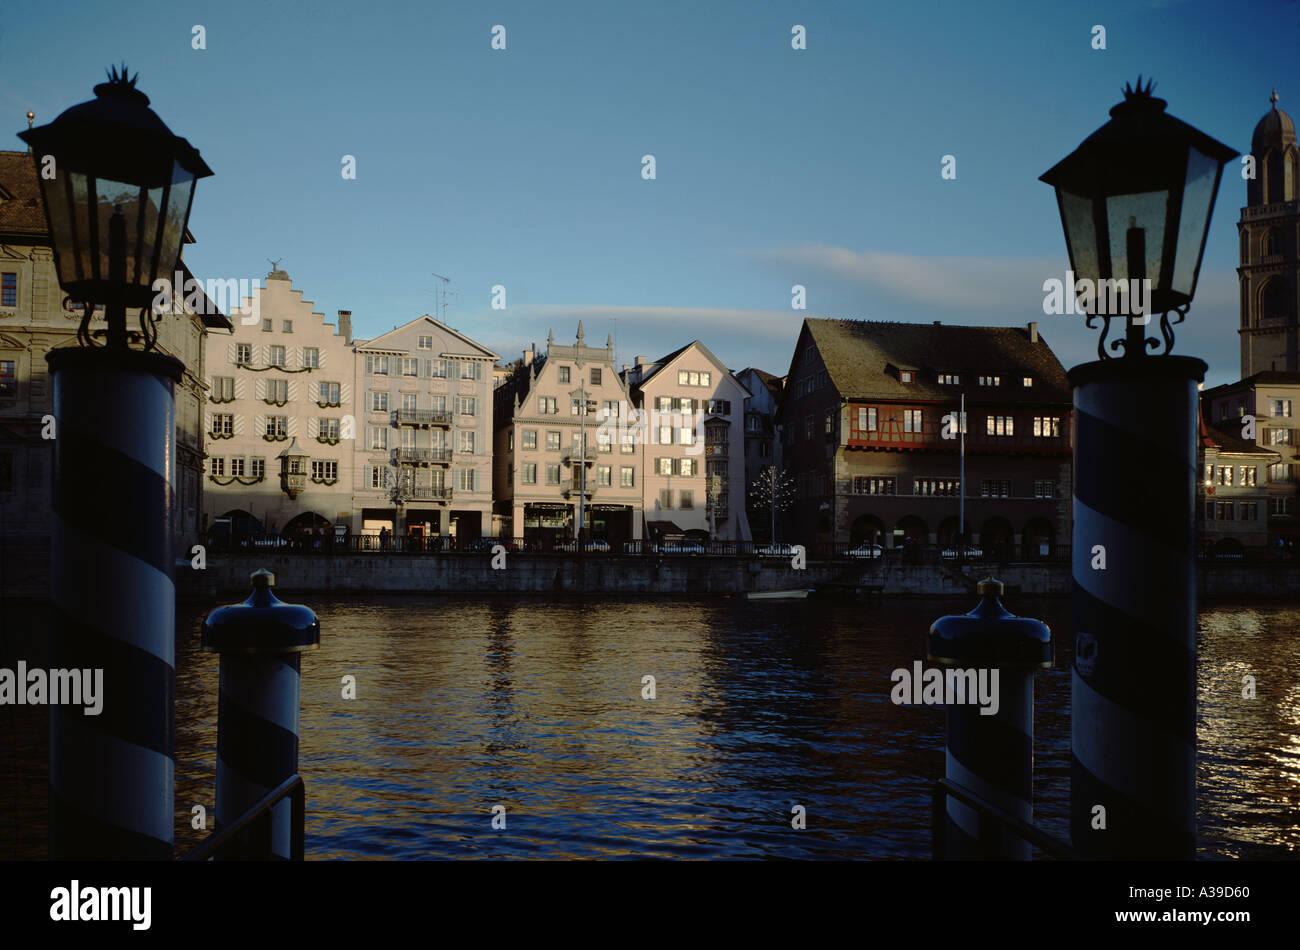 Street Limmatquai River of Limmat City of Zurich Downtown Canton of Zurich Switzerland - Stock Image